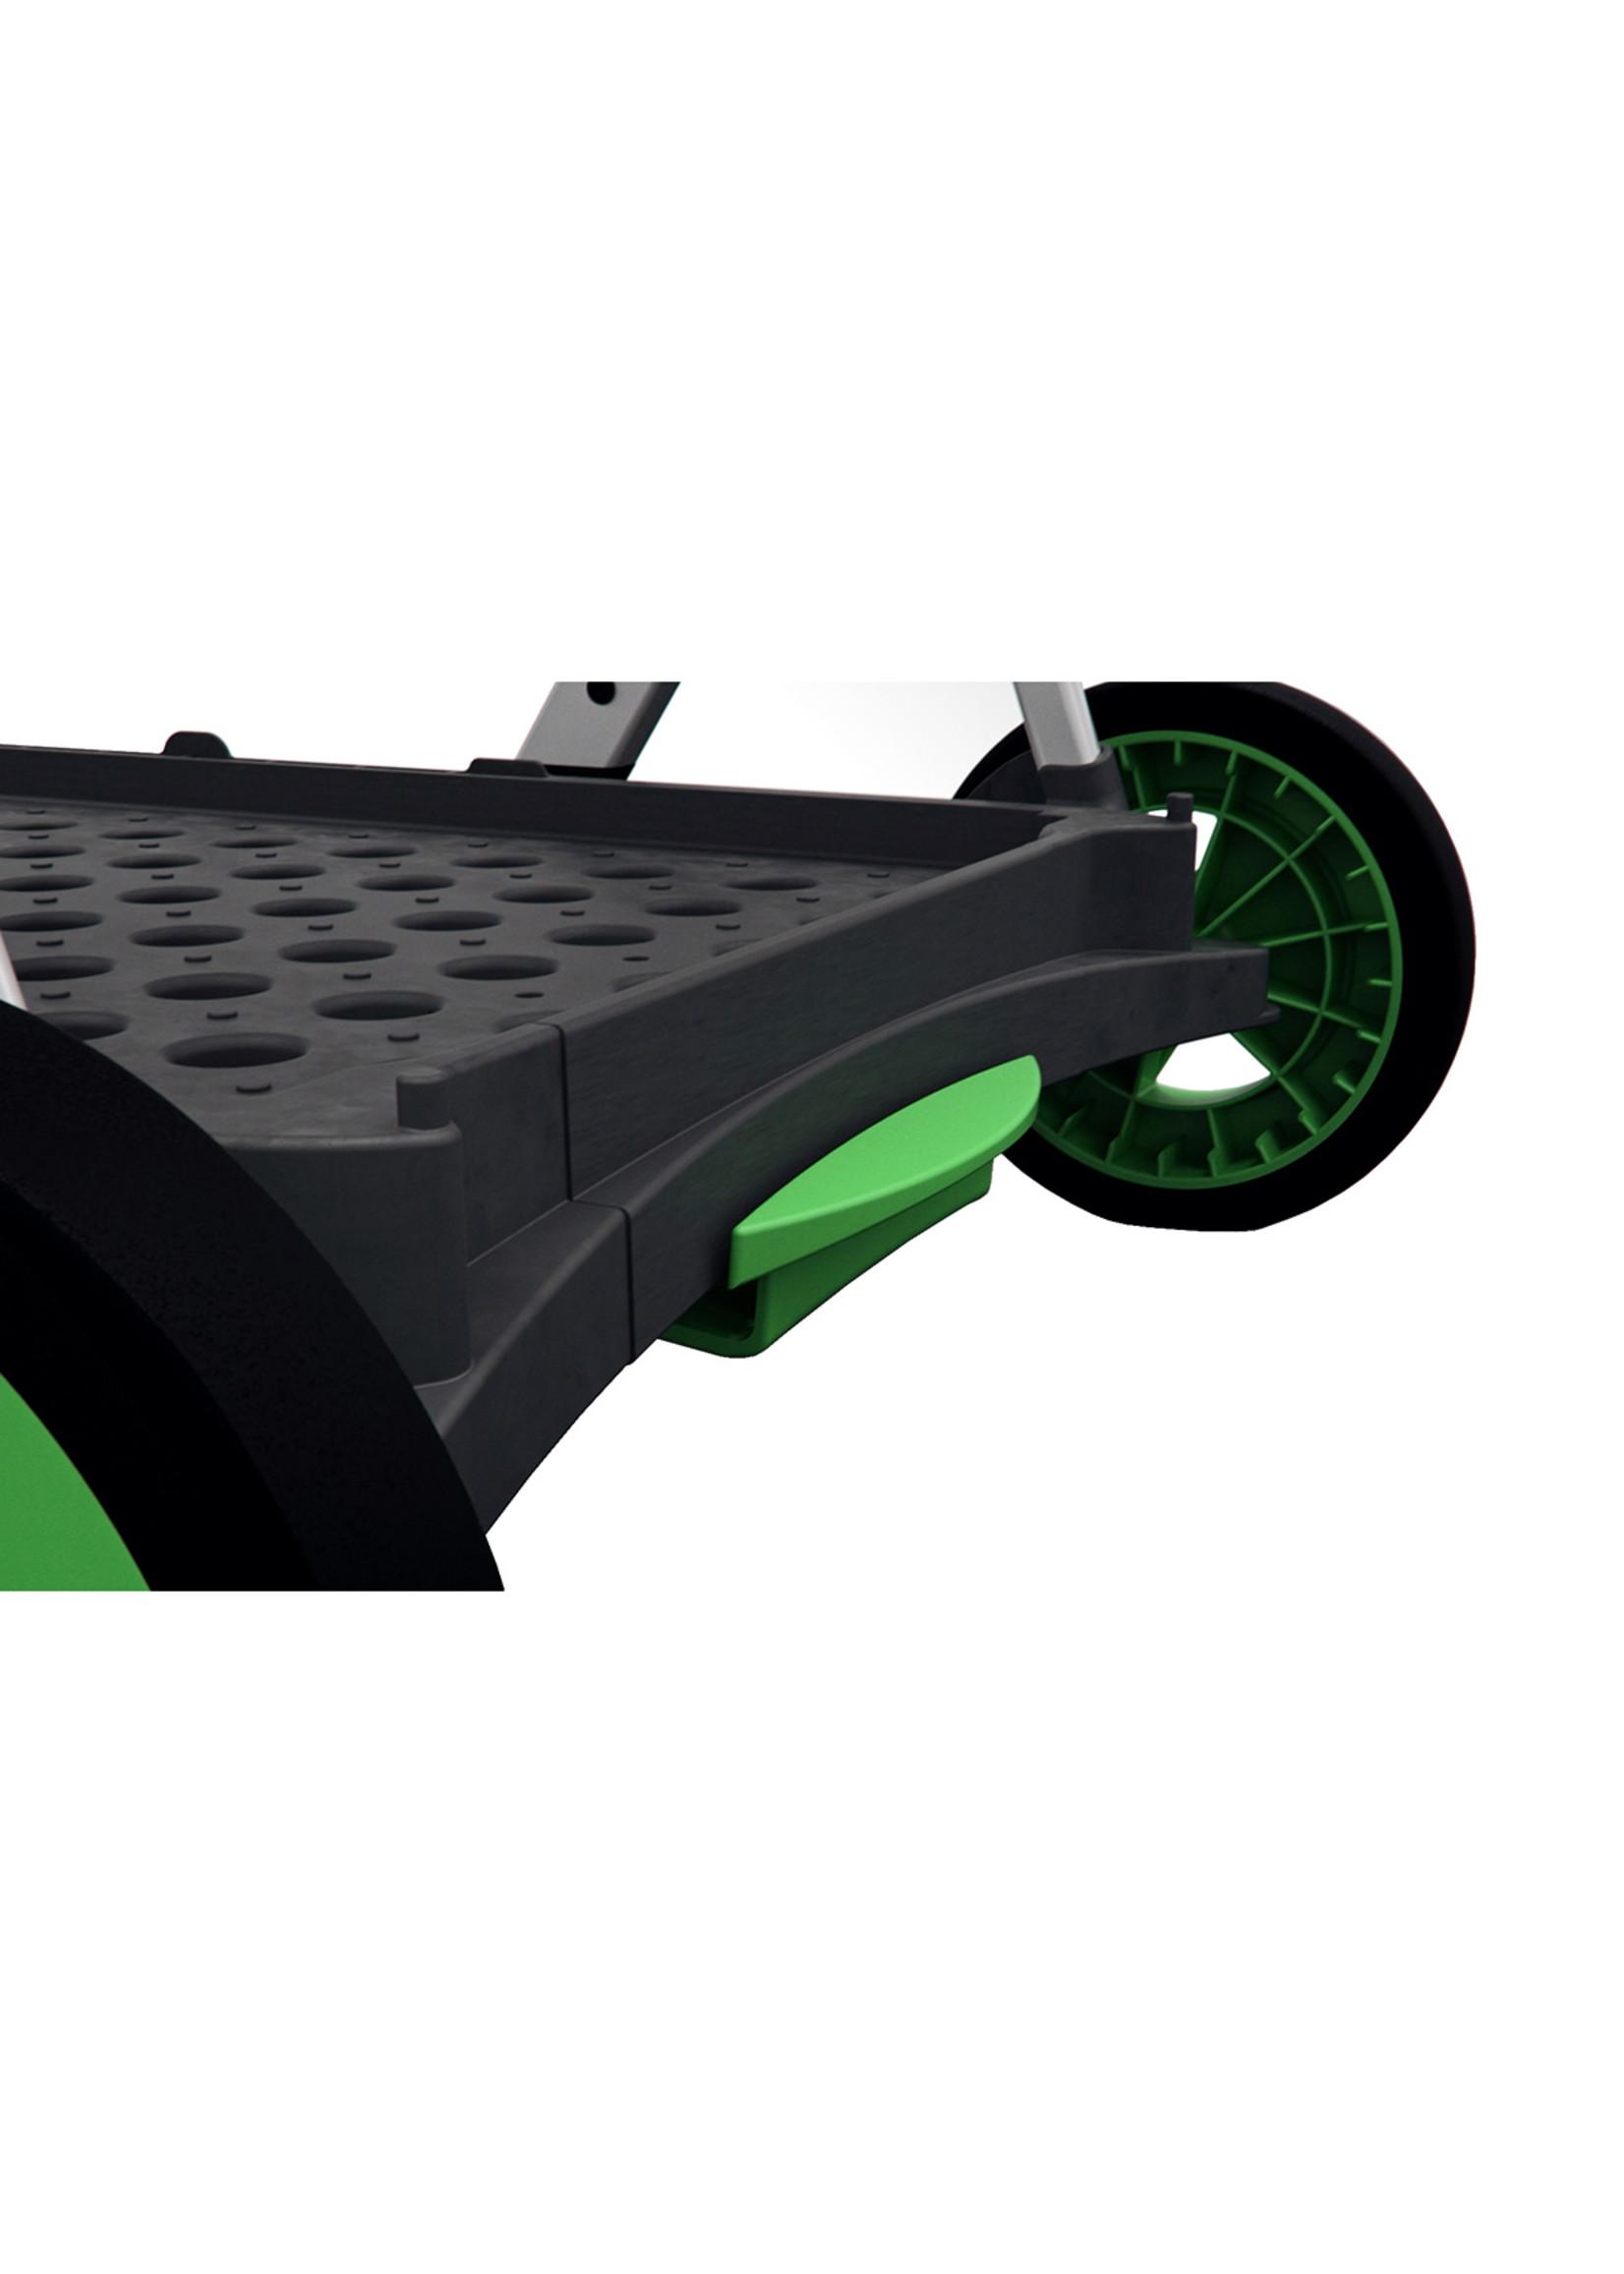 Clax Clax trolley inclusief vouwkrat